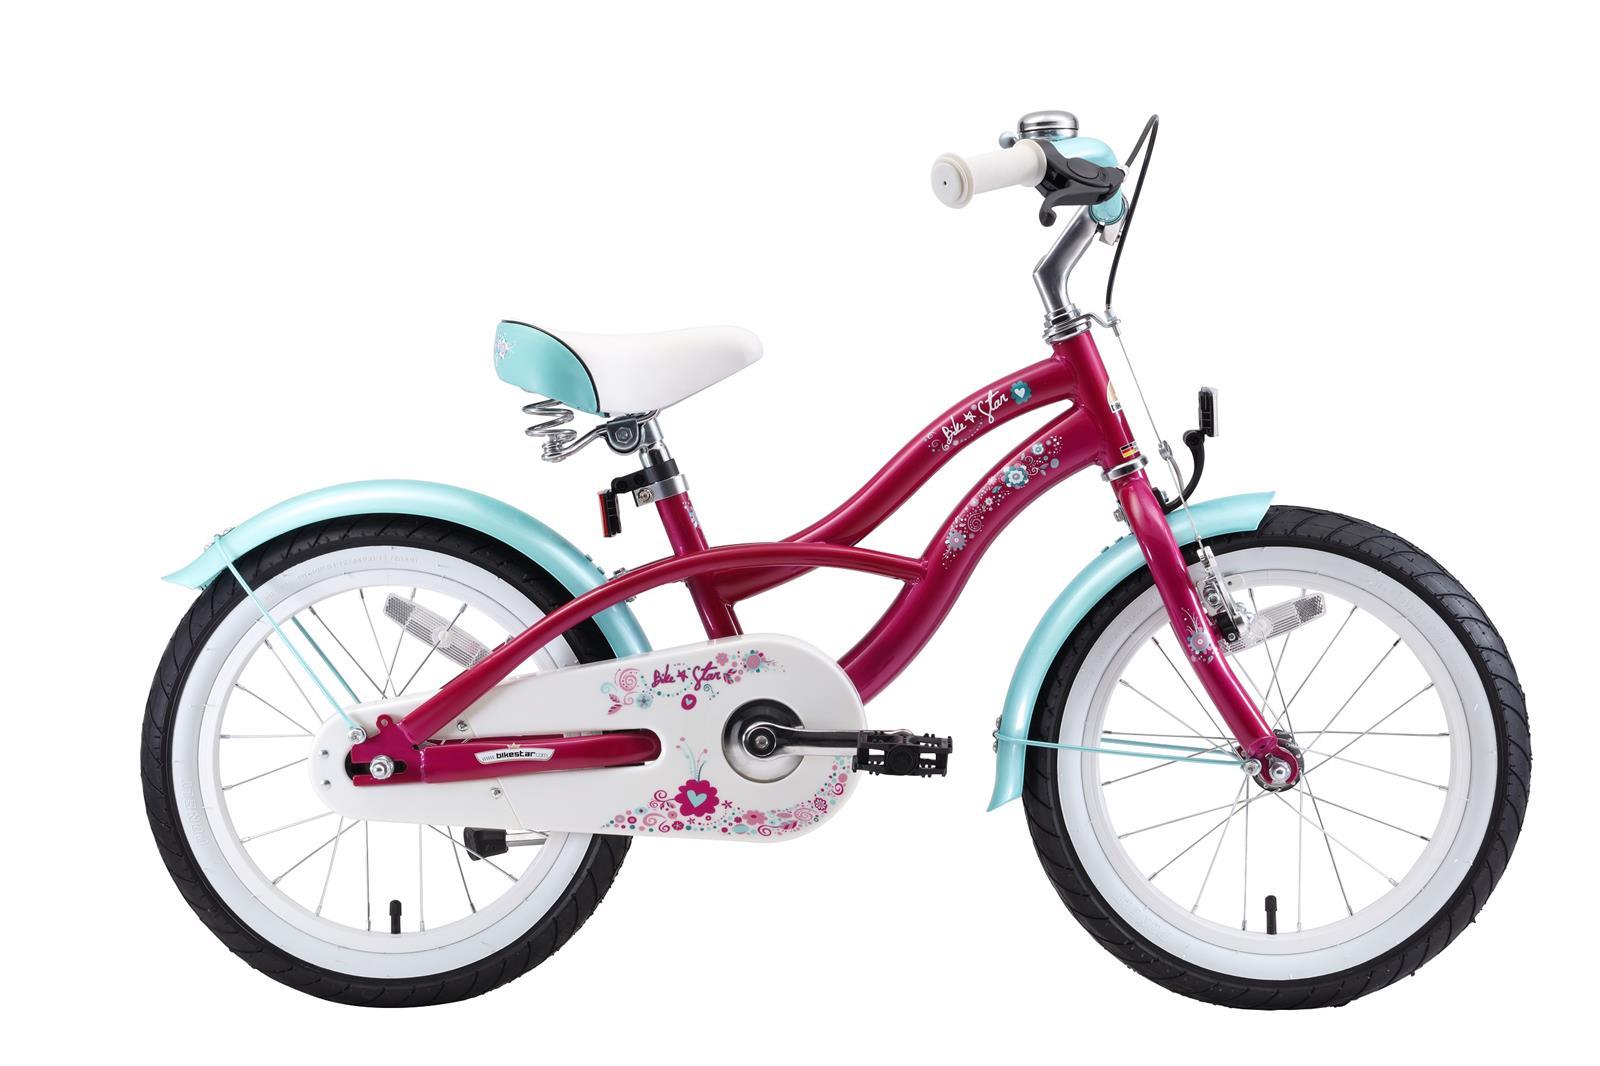 bi 16 cr 01 lila bikestar new 16 zoll kindercruiser lila. Black Bedroom Furniture Sets. Home Design Ideas